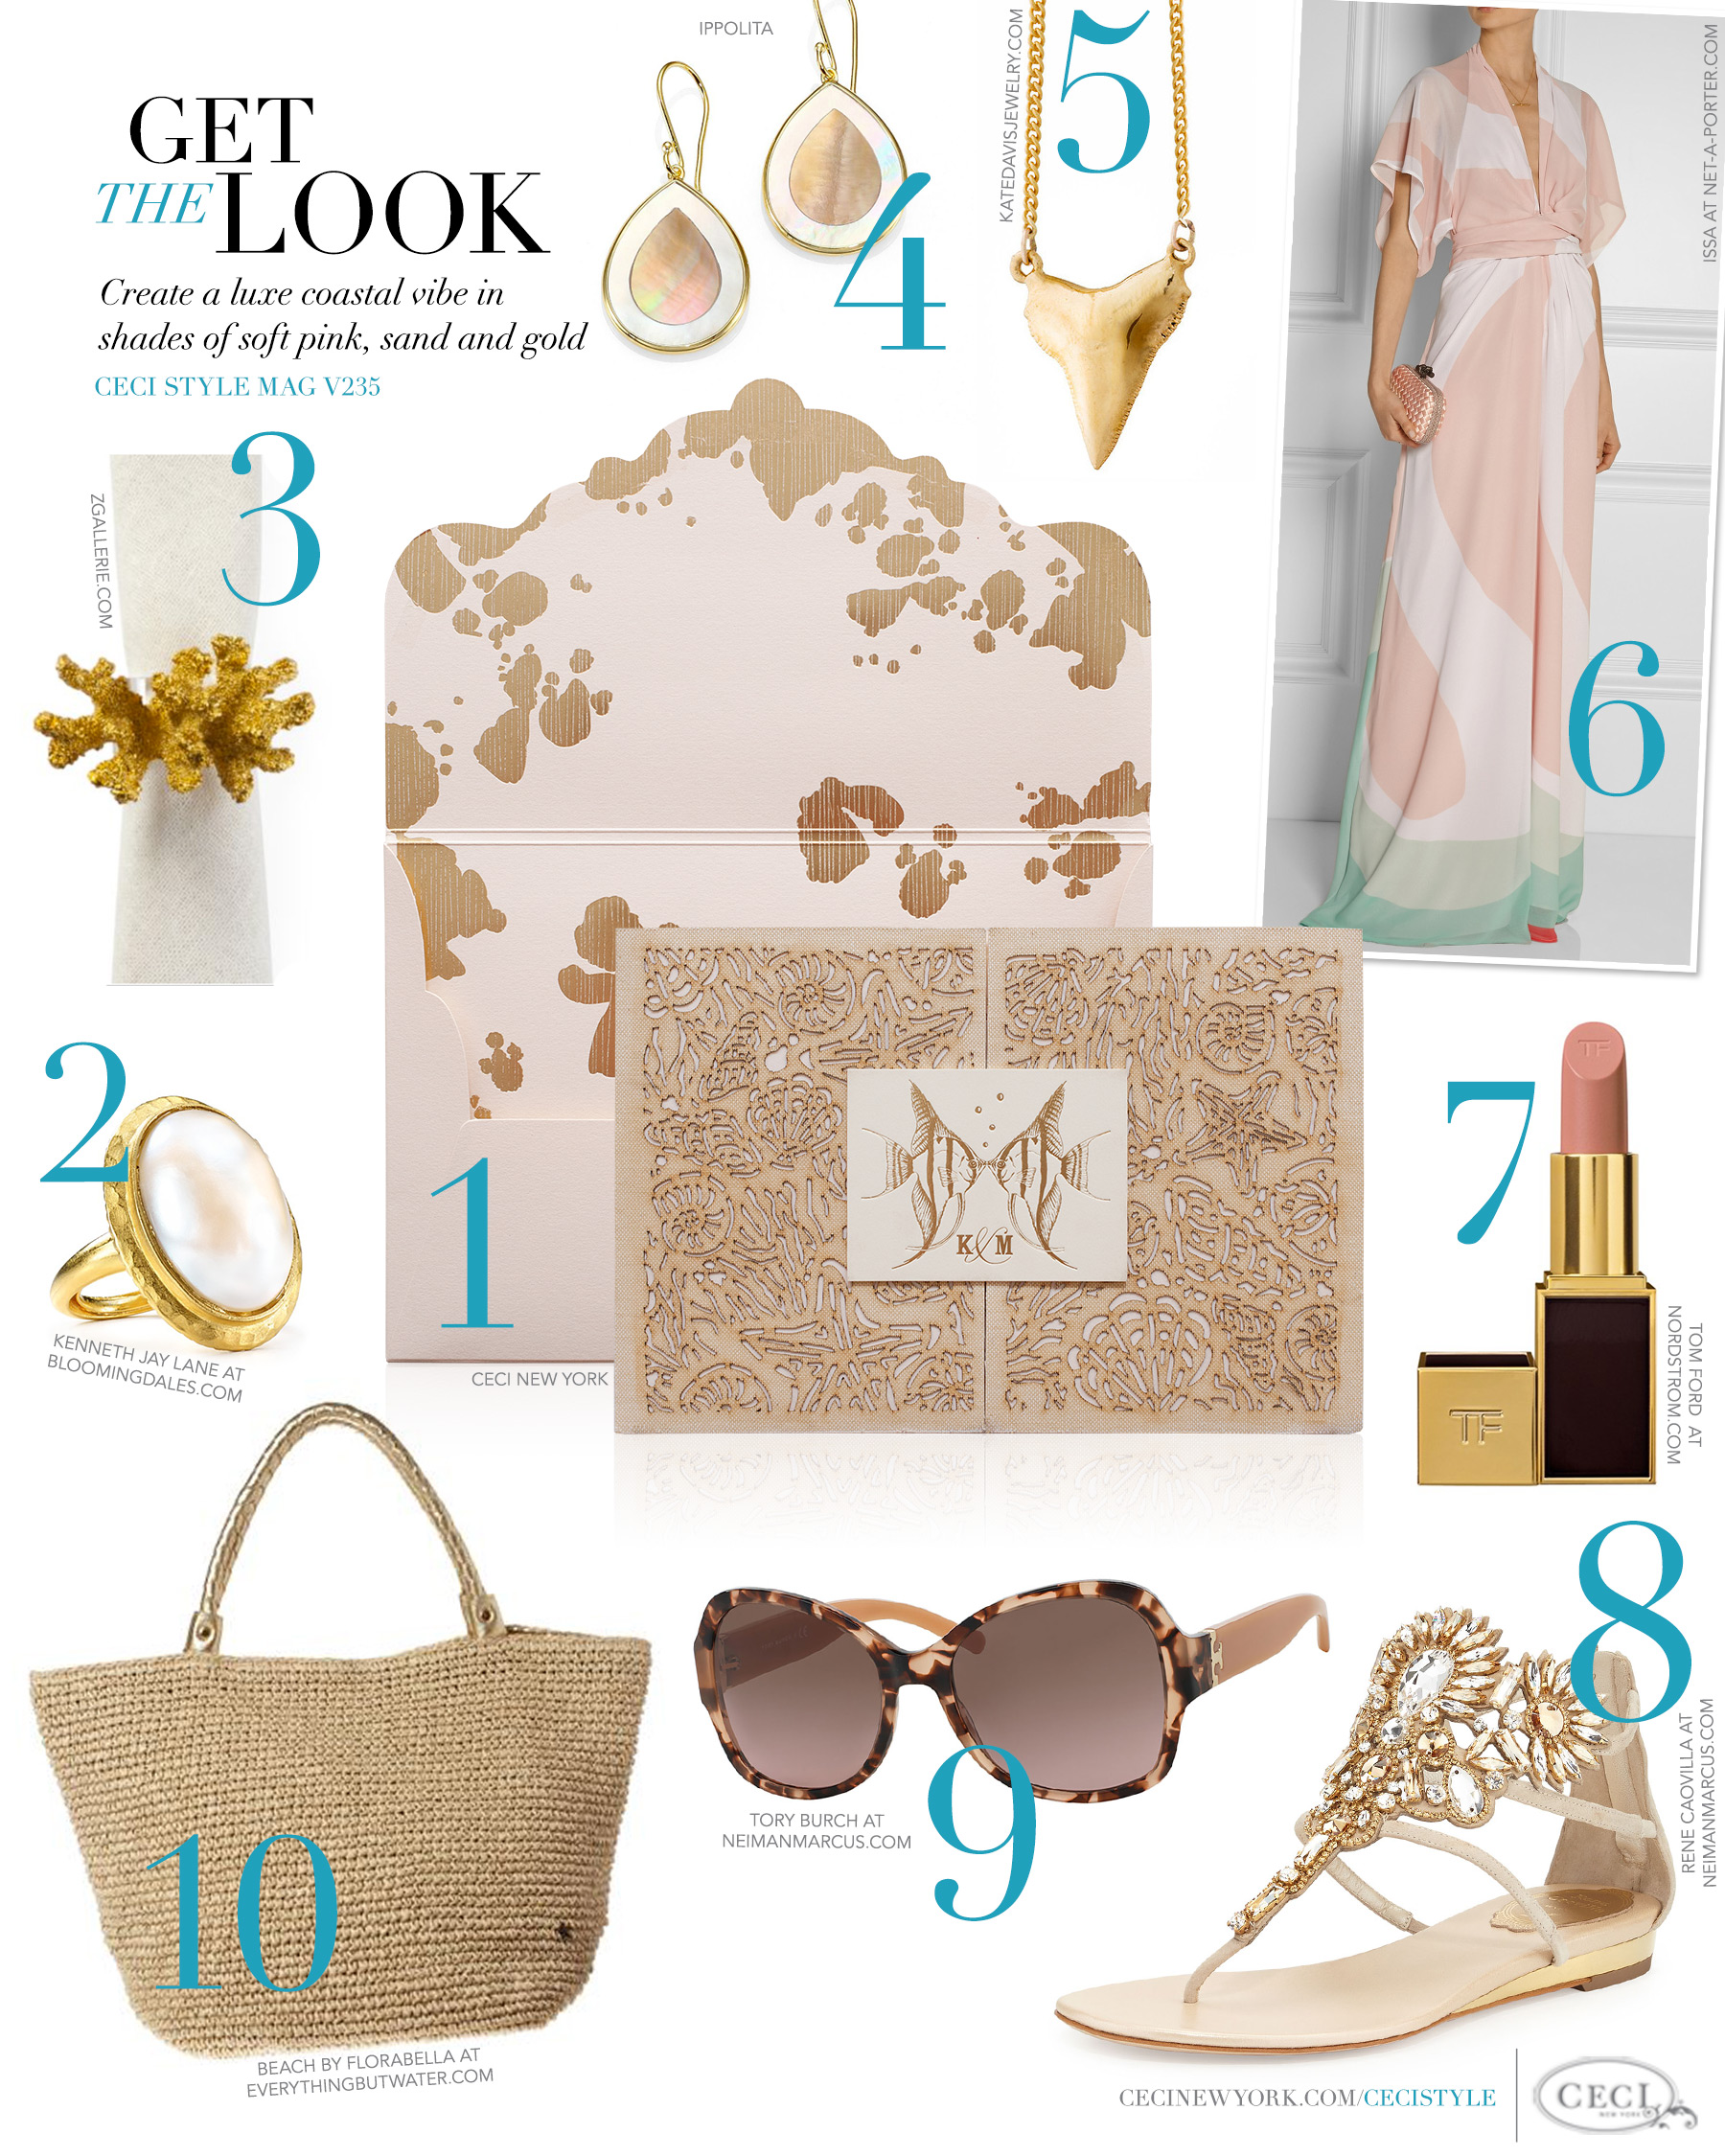 Z Gallerie Wedding Gifts : ... gallerie, ippolita, kate davis, pollyanna, tom ford, rene caovilla